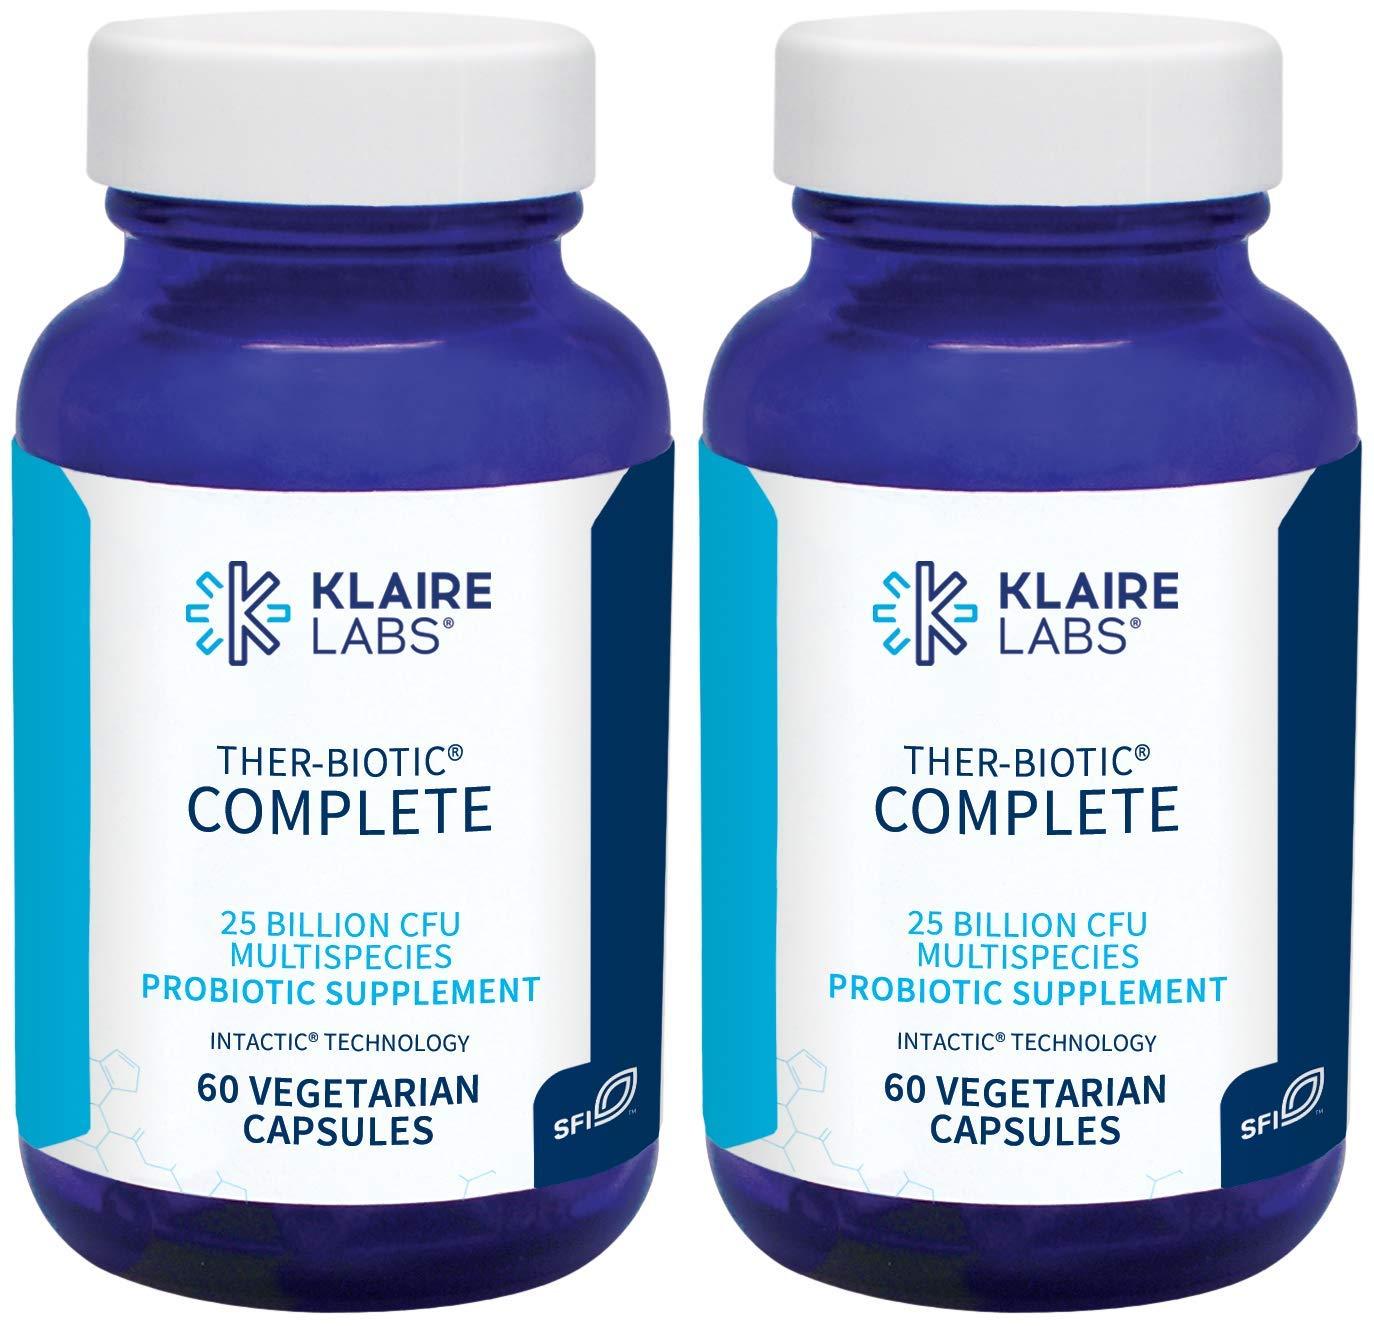 Klaire Labs Ther-Biotic Complete Probiotic - 25 Billion High CFU Blend, The Original Hypoallergenic Probiotic for Men & Women, Dairy-Free (60 Capsules / 2 Pack)